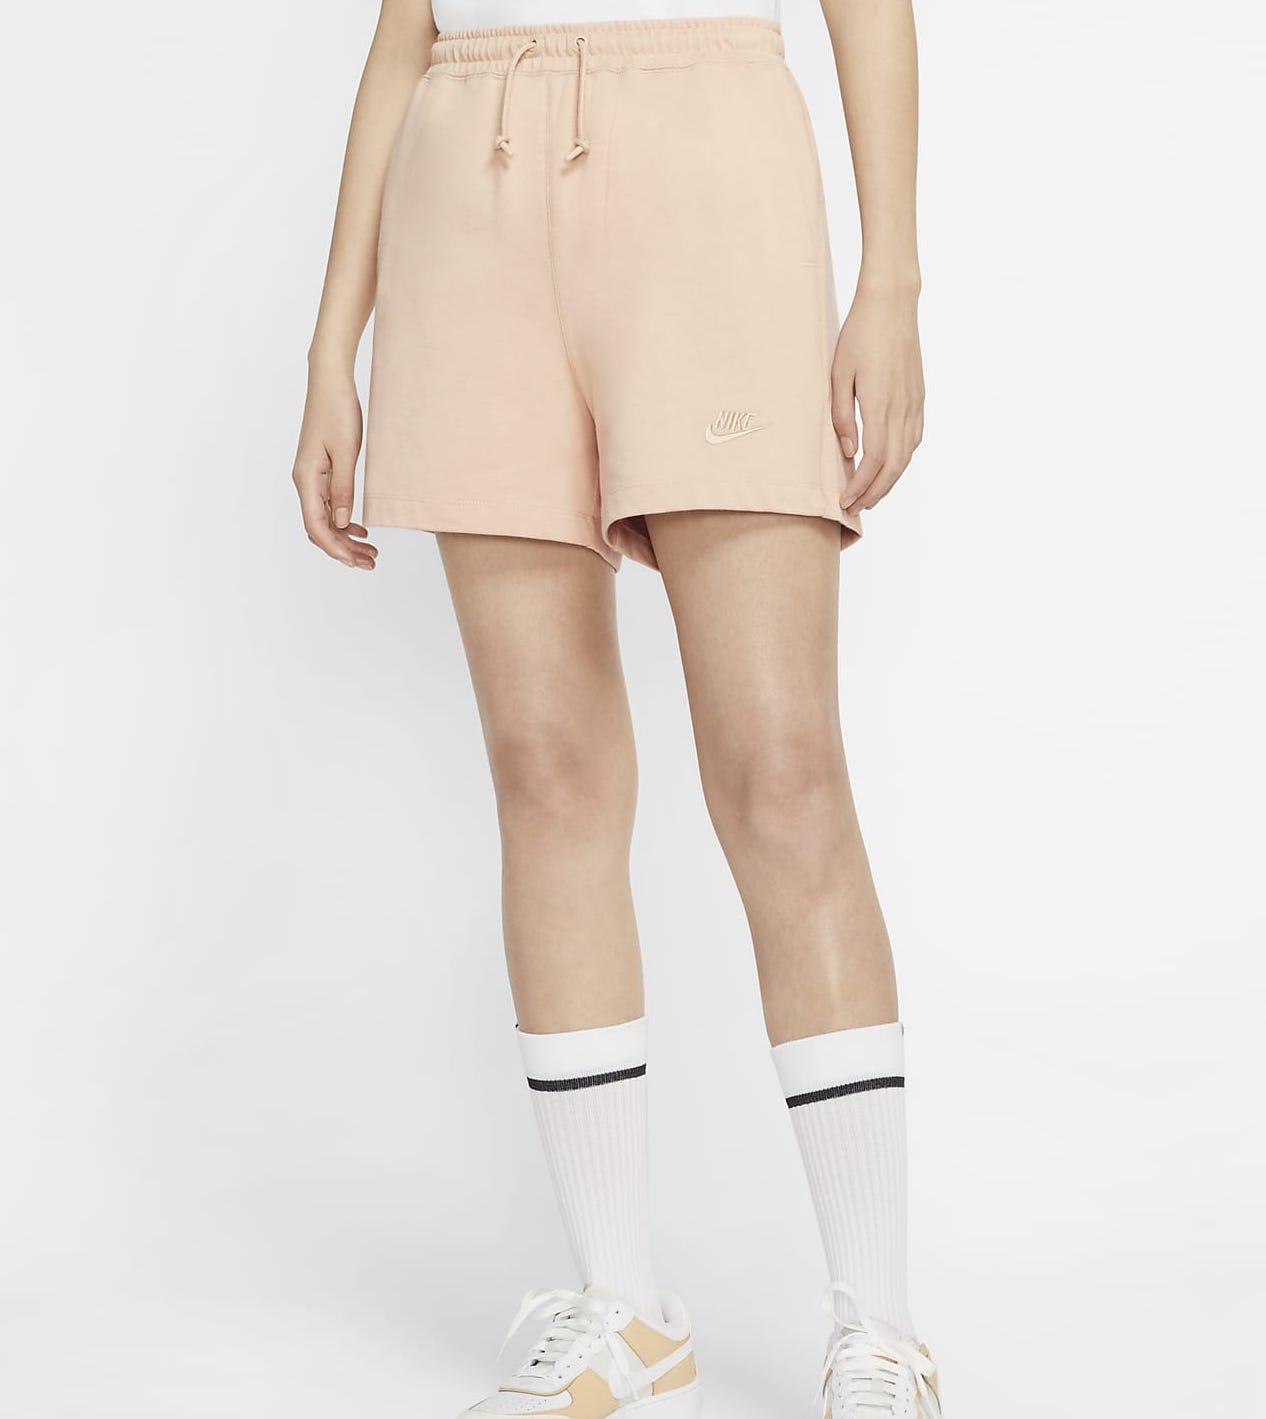 Nike Sportswear Jersey Shorts Shimmer